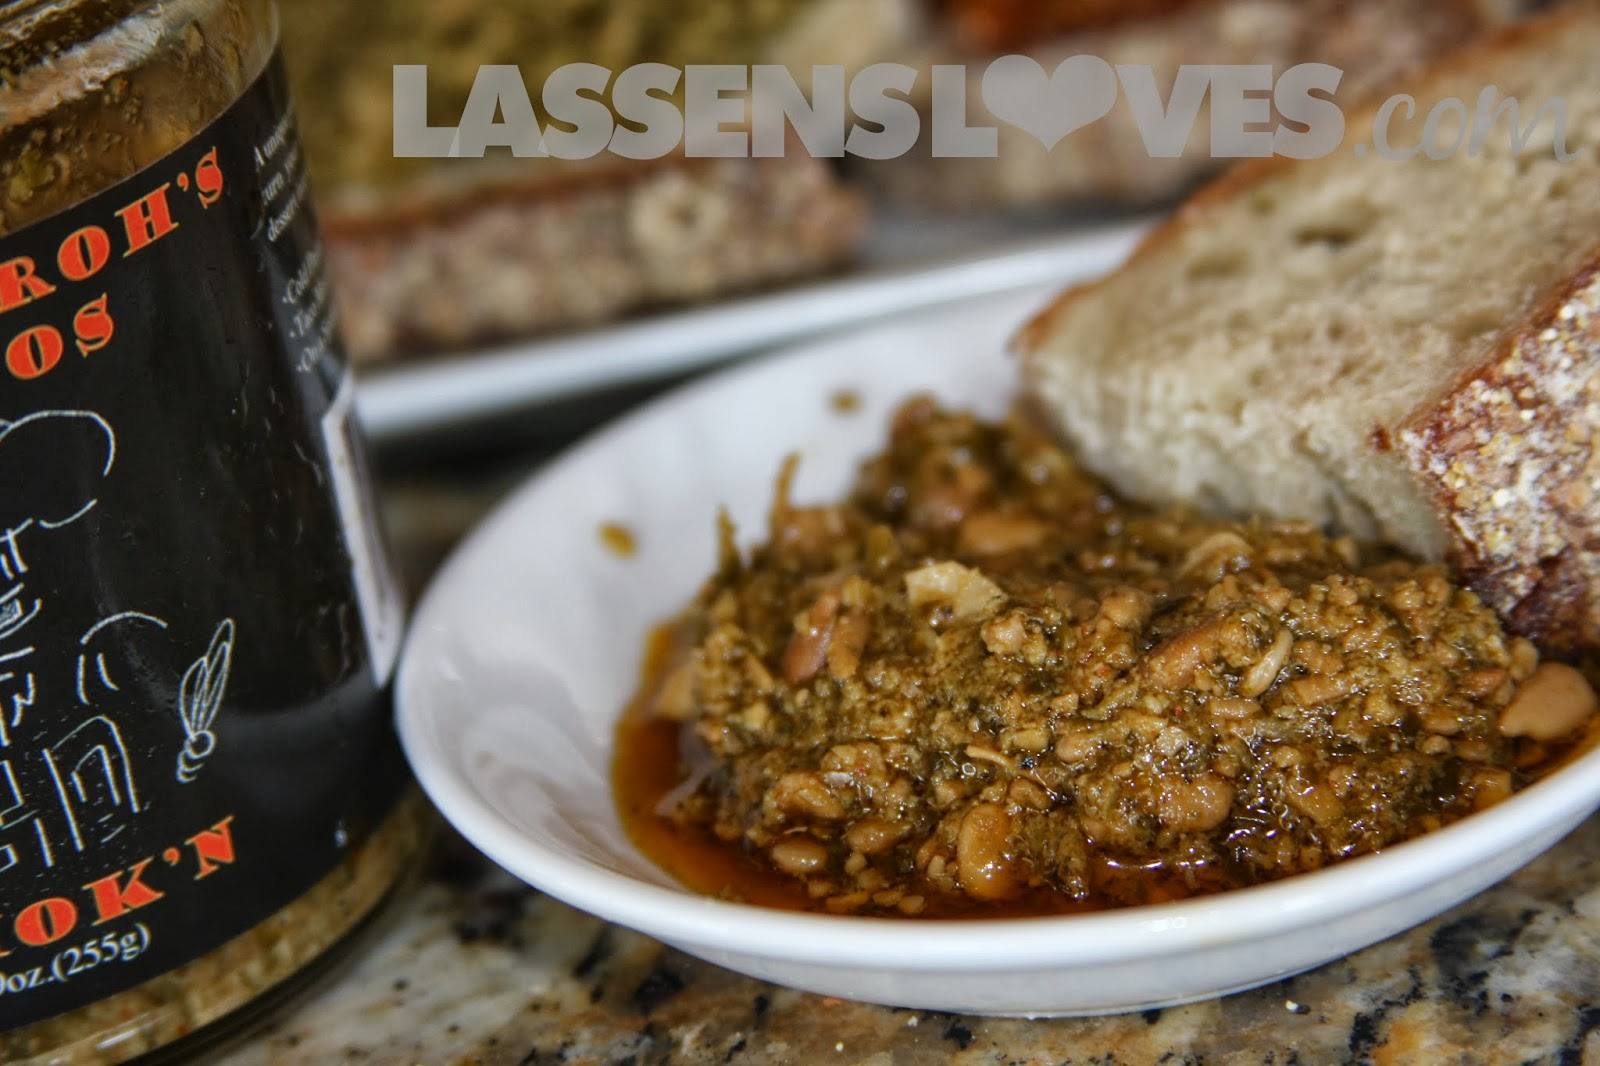 lassensloves.com, Lassen's, Chef+Stroh's+Pesto